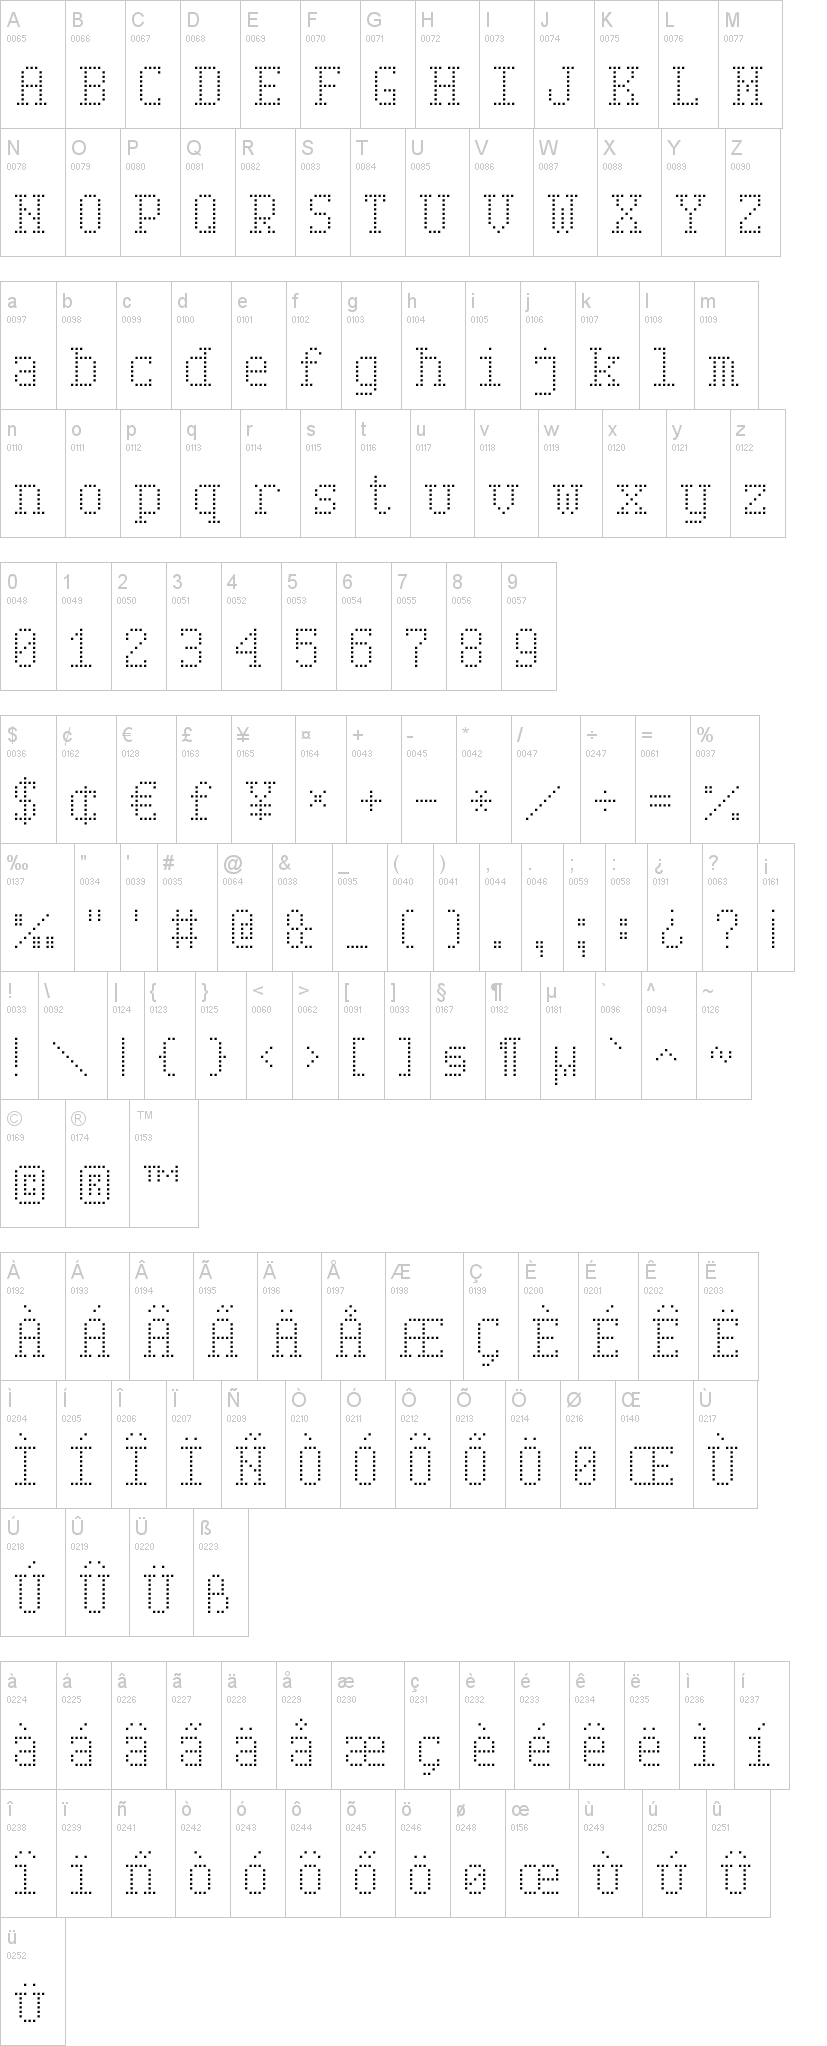 Serif Dot Digital-7 Font | dafont com